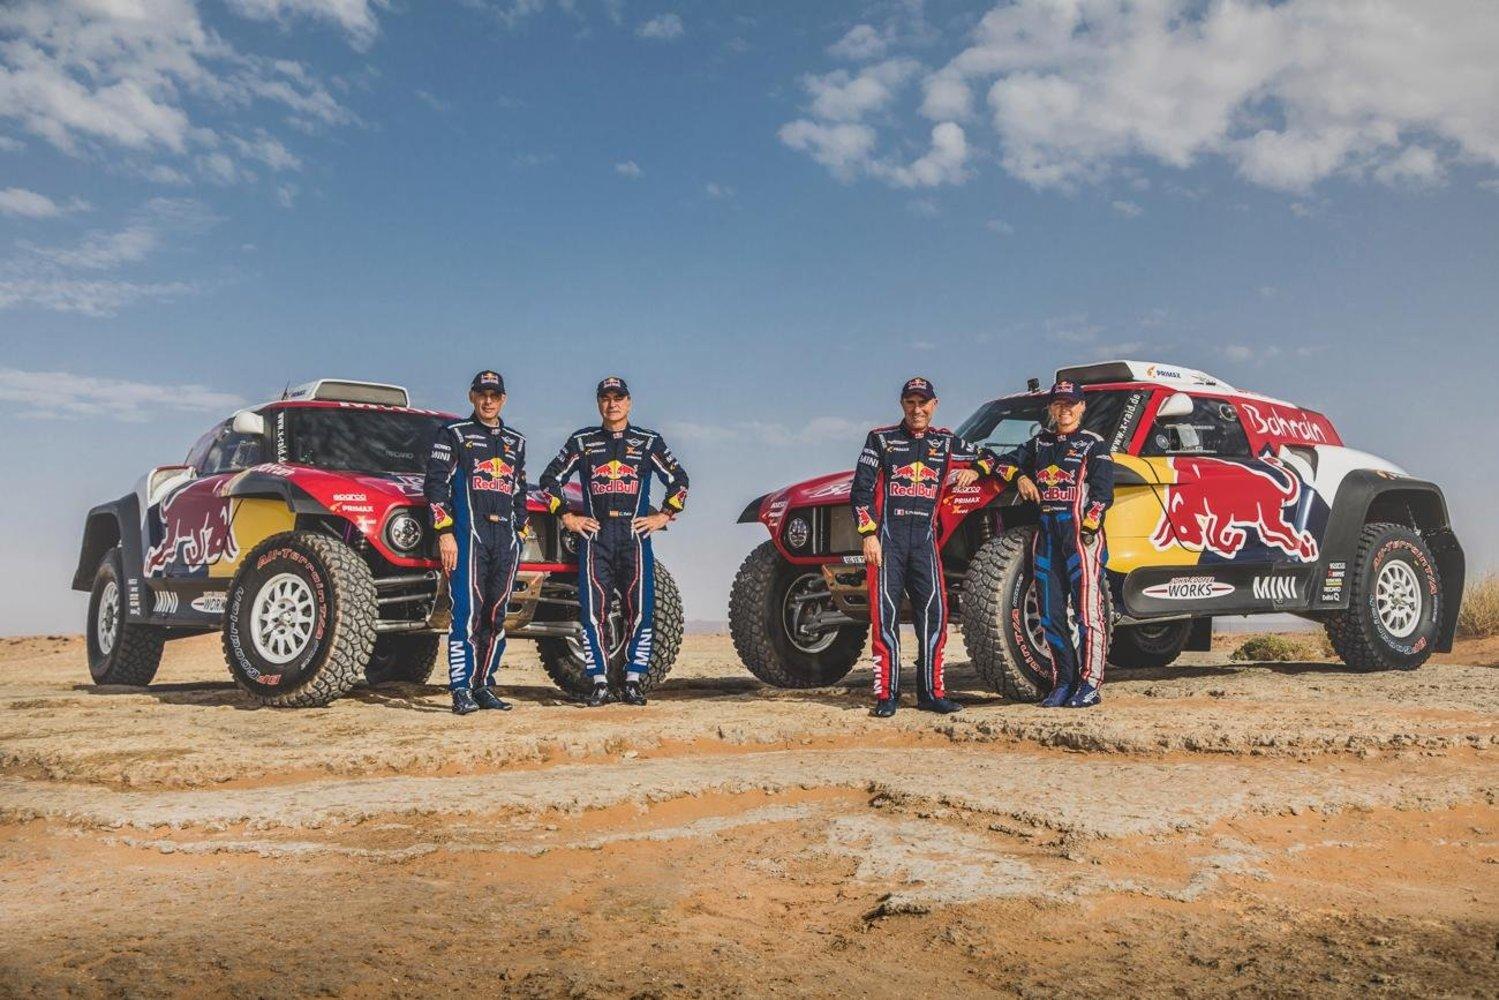 Equipo Mini Dakar 2020